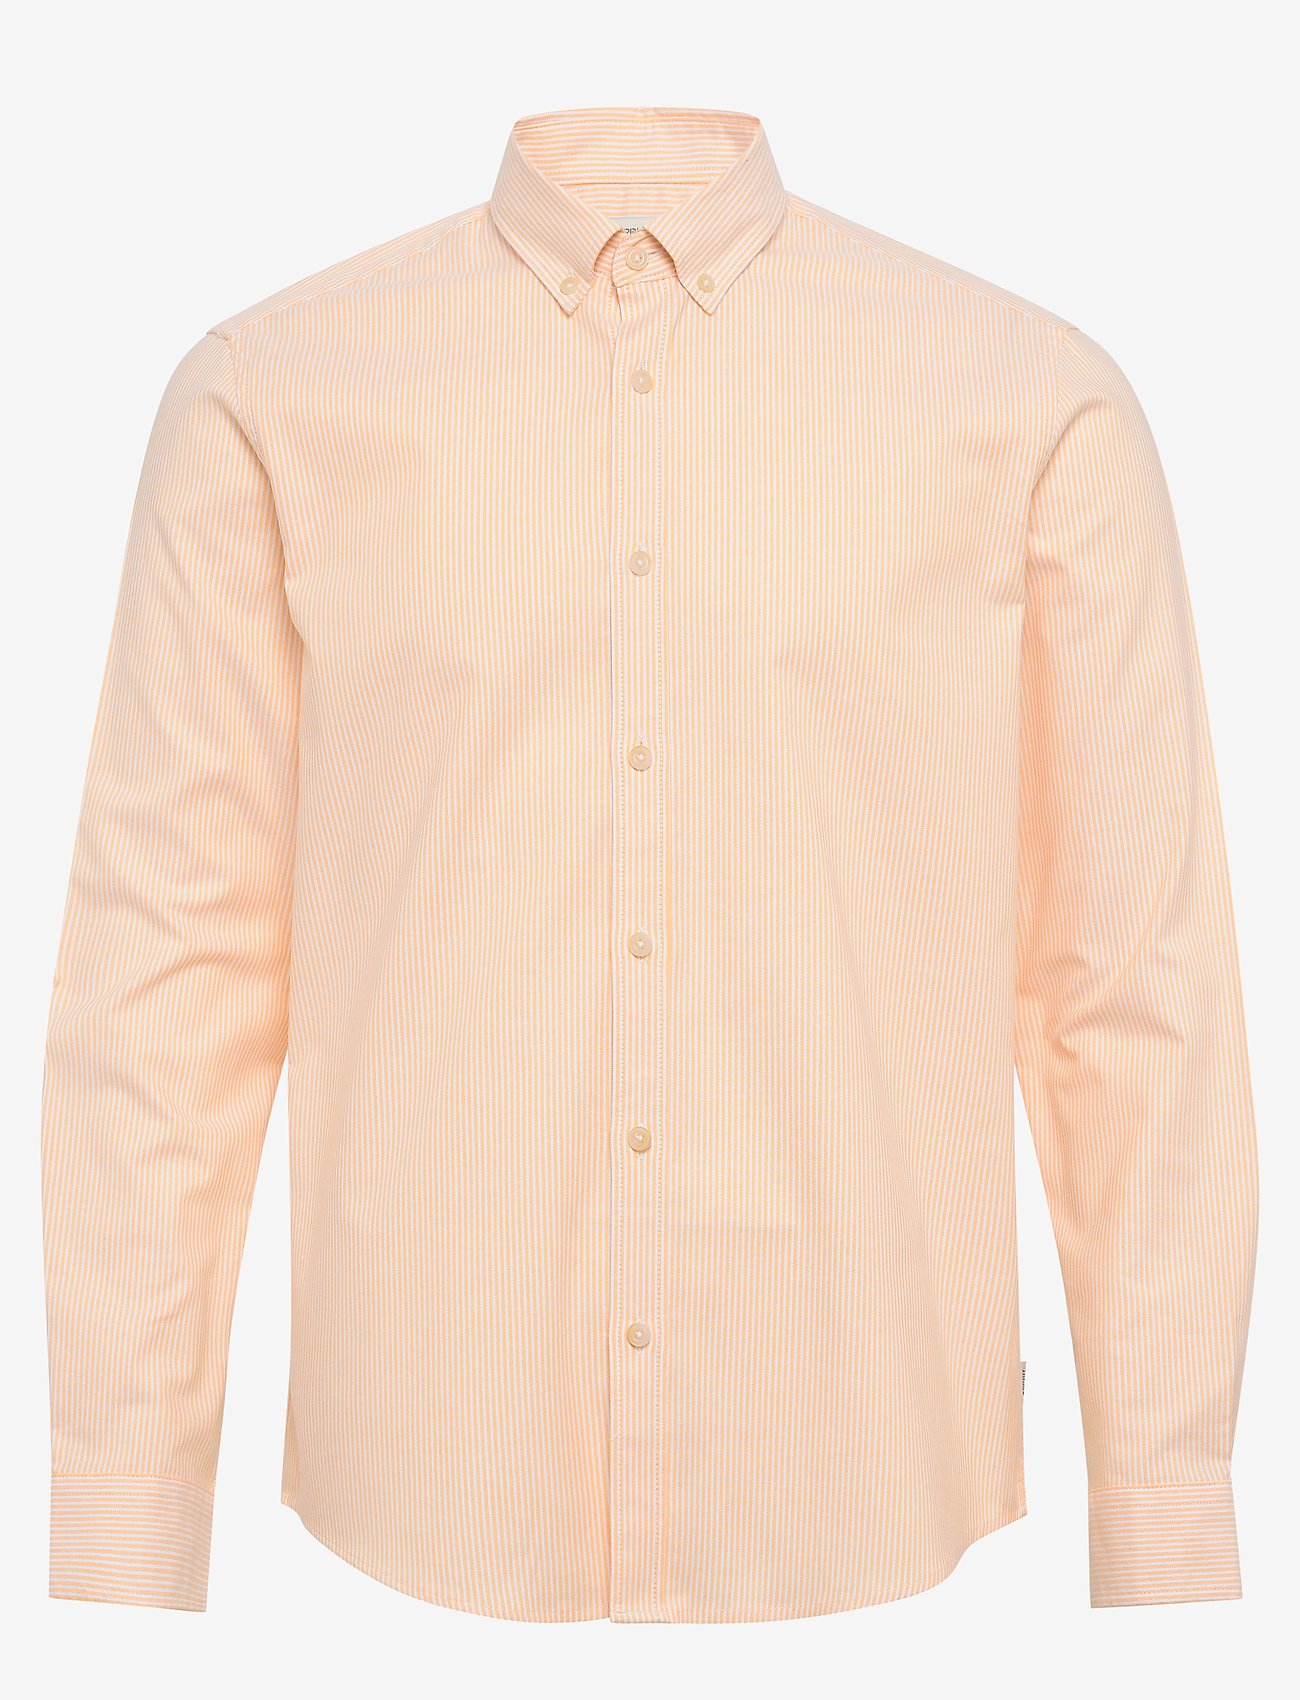 Esprit Casual - Shirts woven - oxford shirts - honey yellow 3 - 0